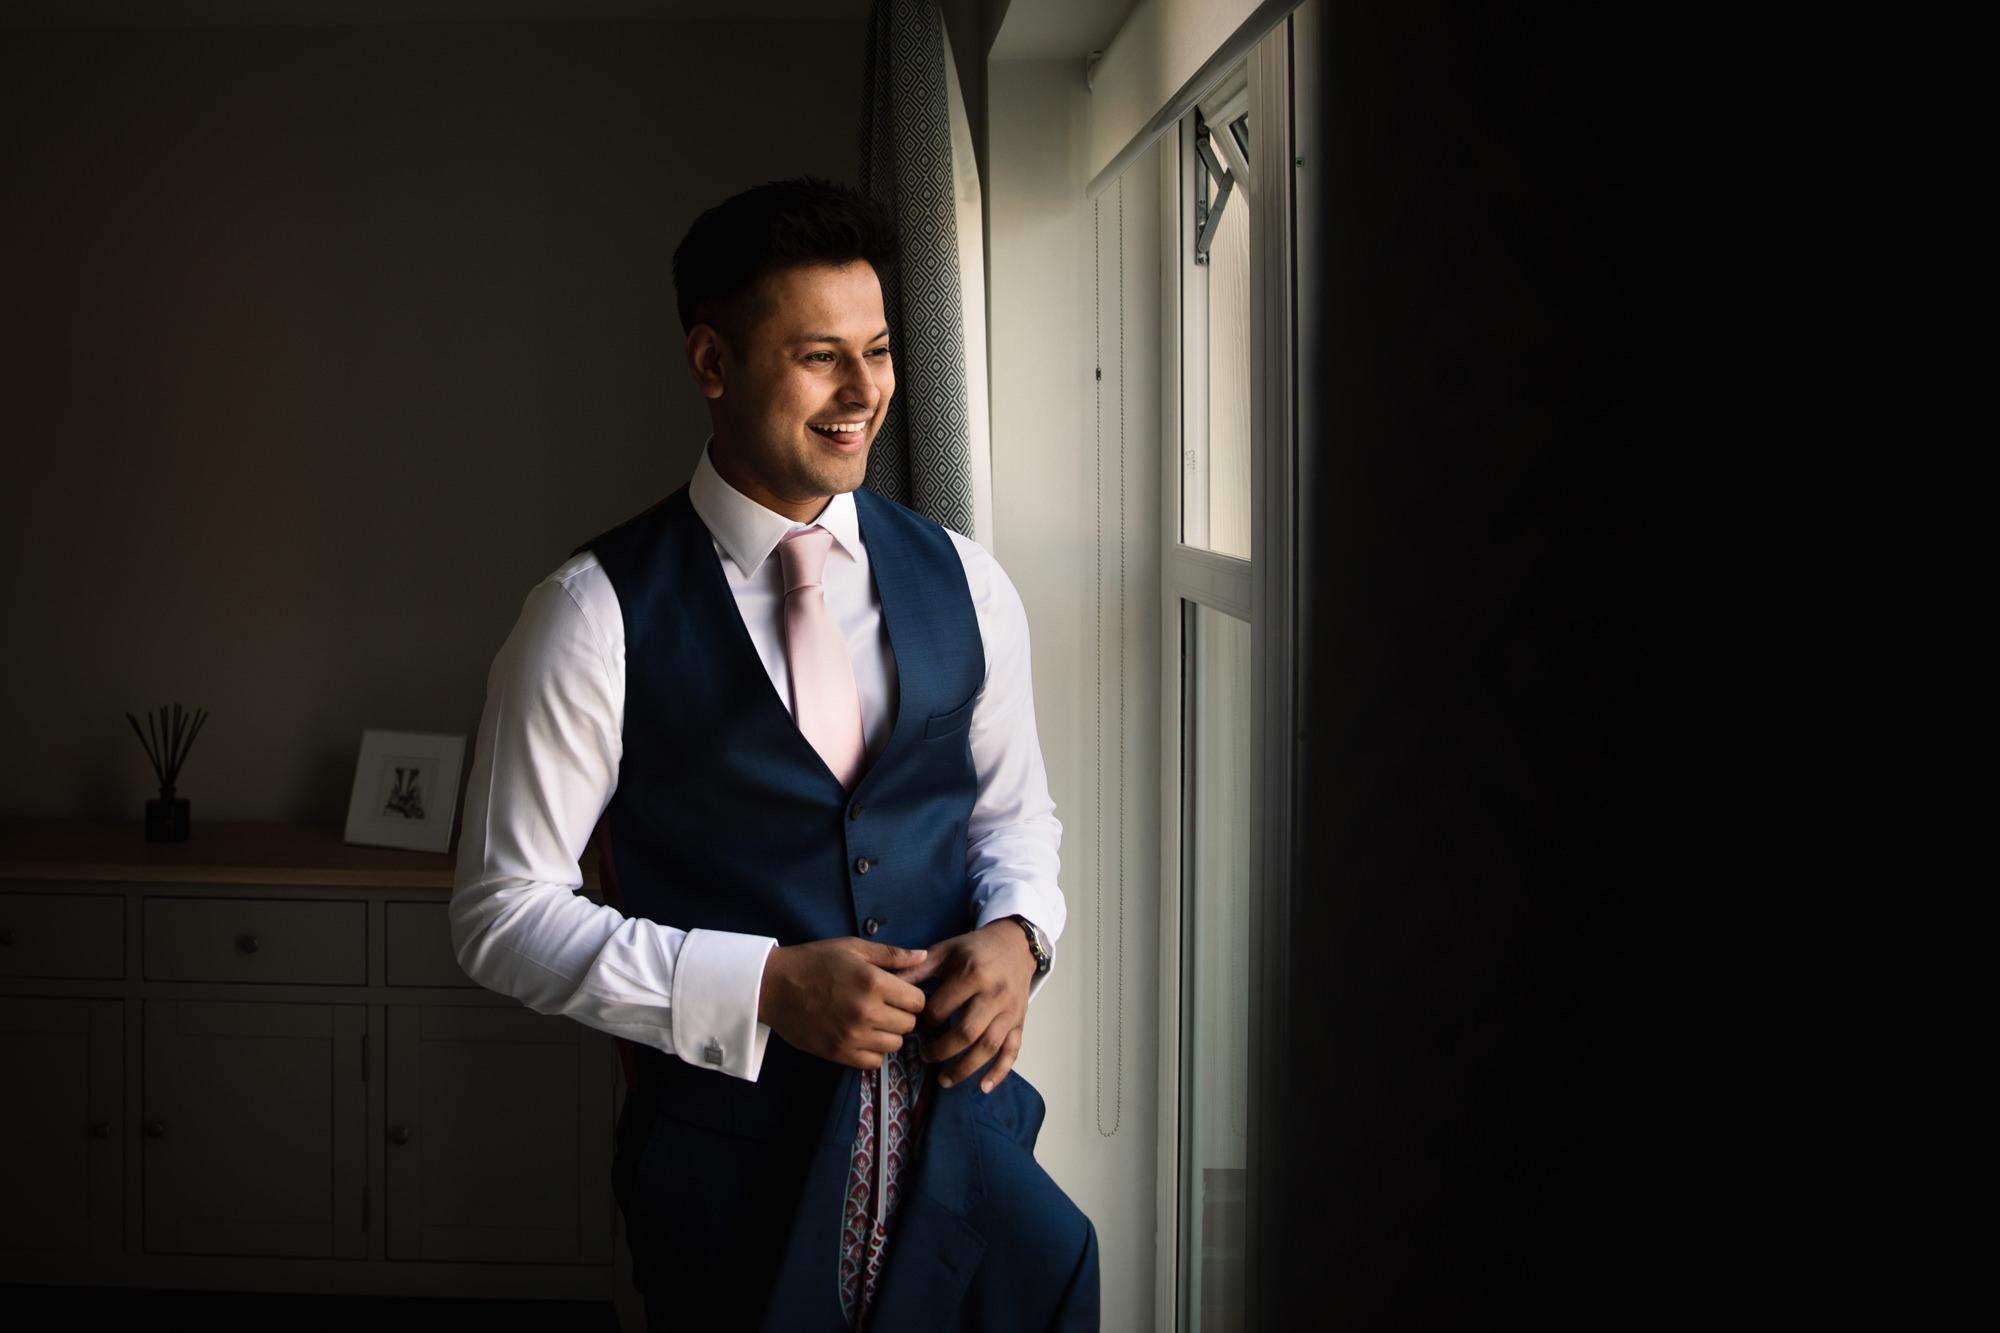 Groom stood by window getting ready for wedding